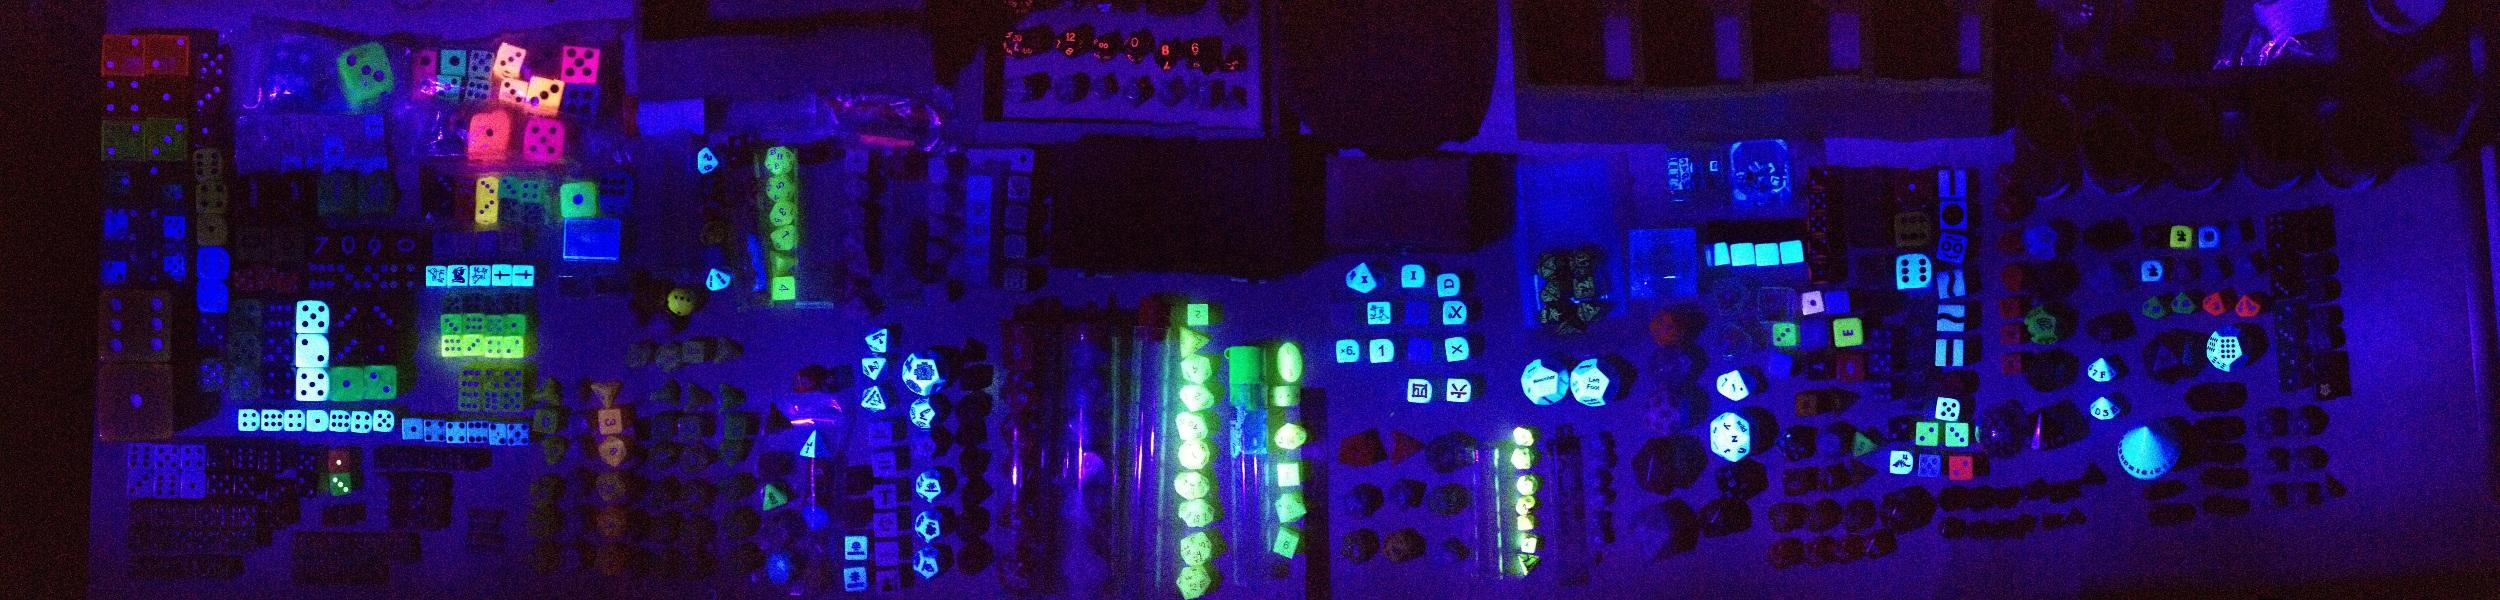 glowrad